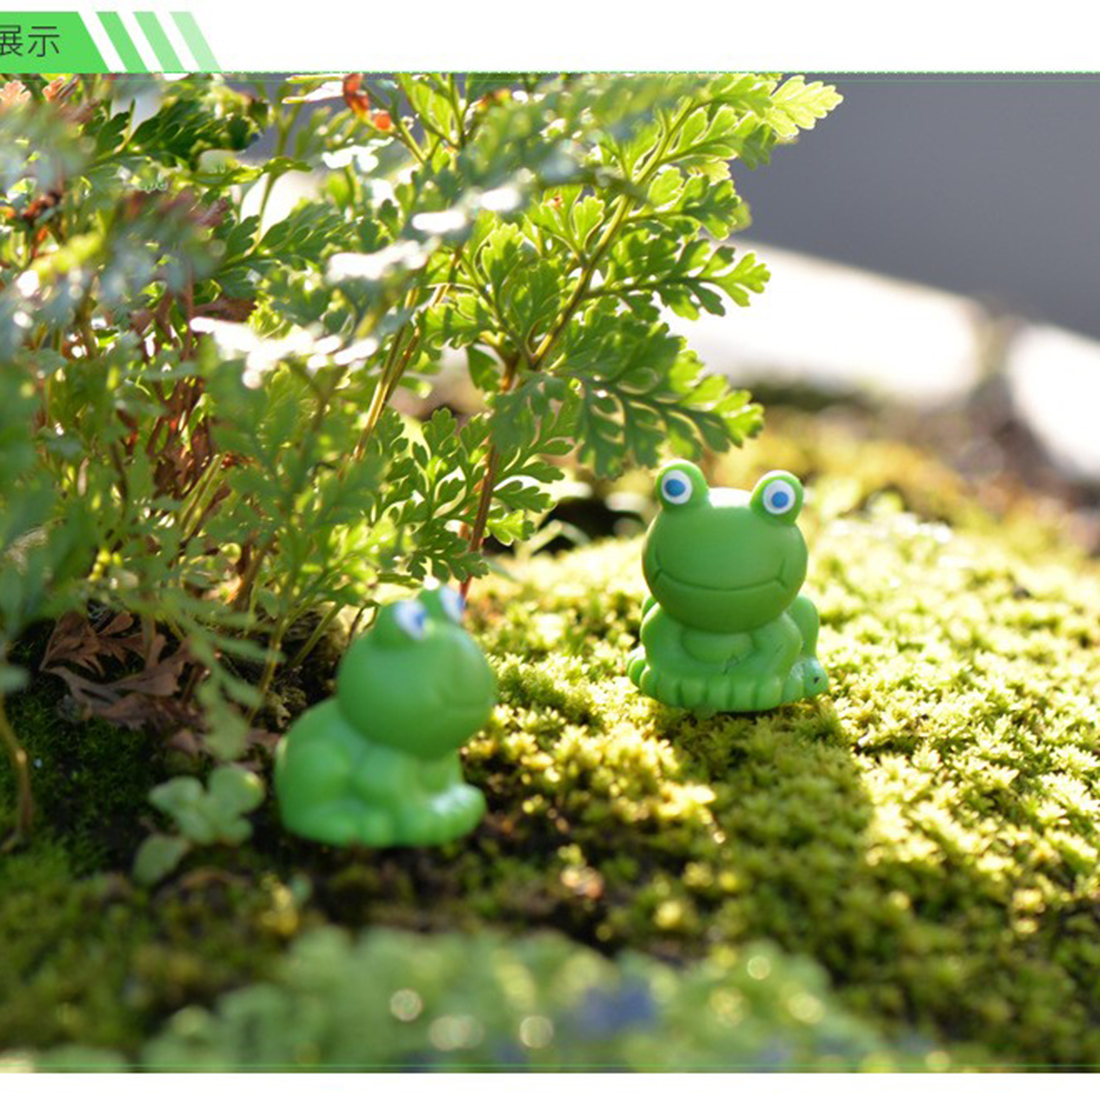 Gnome Garden Decor – Home design and Decorating